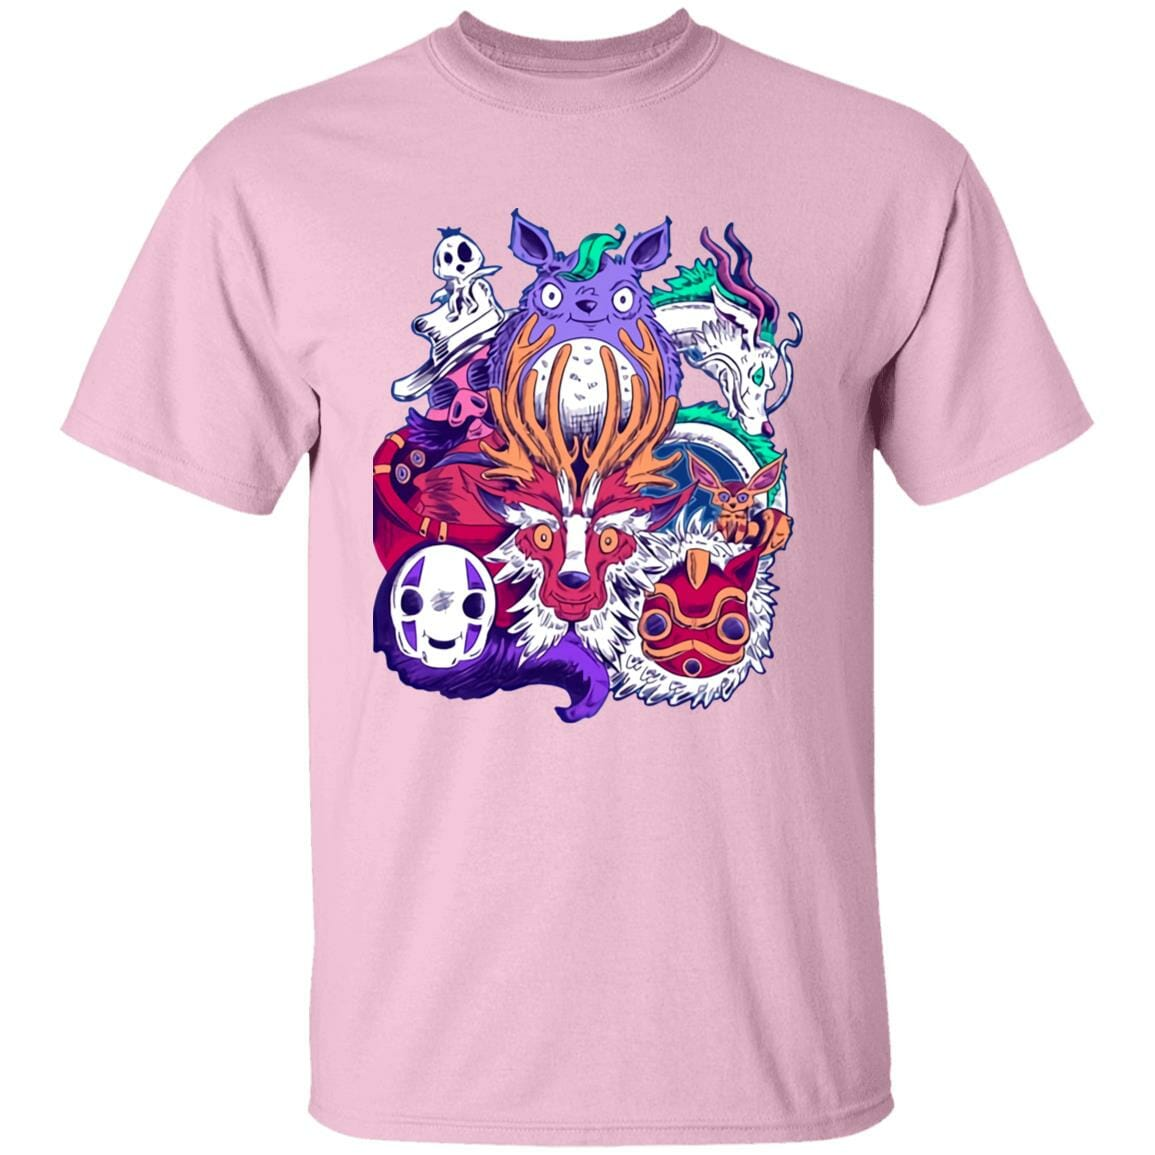 Ghibli Characters creepy style T Shirt